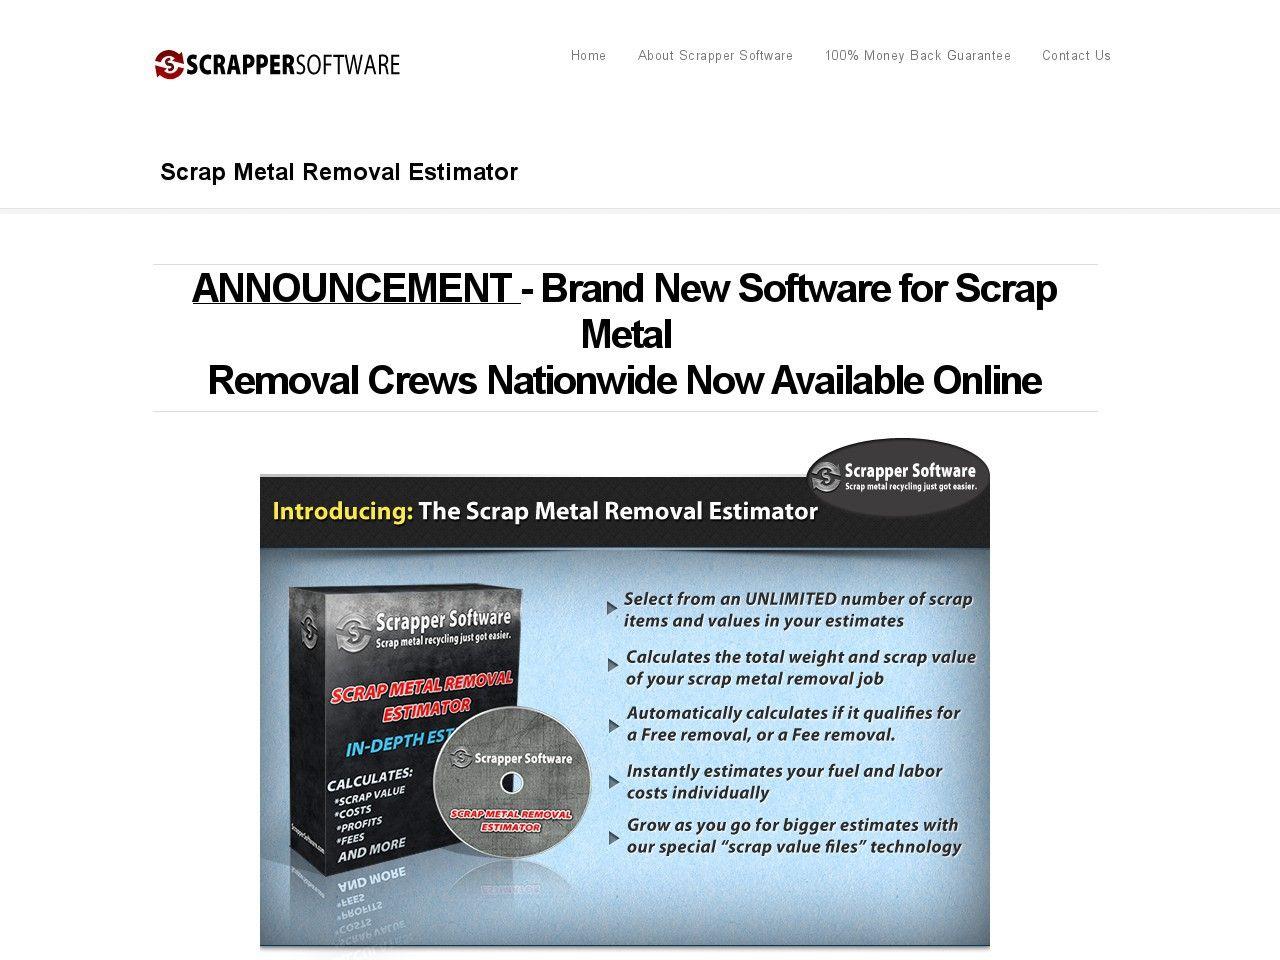 [Get] Scrap Metal Removal Estimator - Killer Software In Recycling Niche! - http://www.vnulab.be/lab-review/scrap-metal-removal-estimator-killer-software-in-recycling-niche